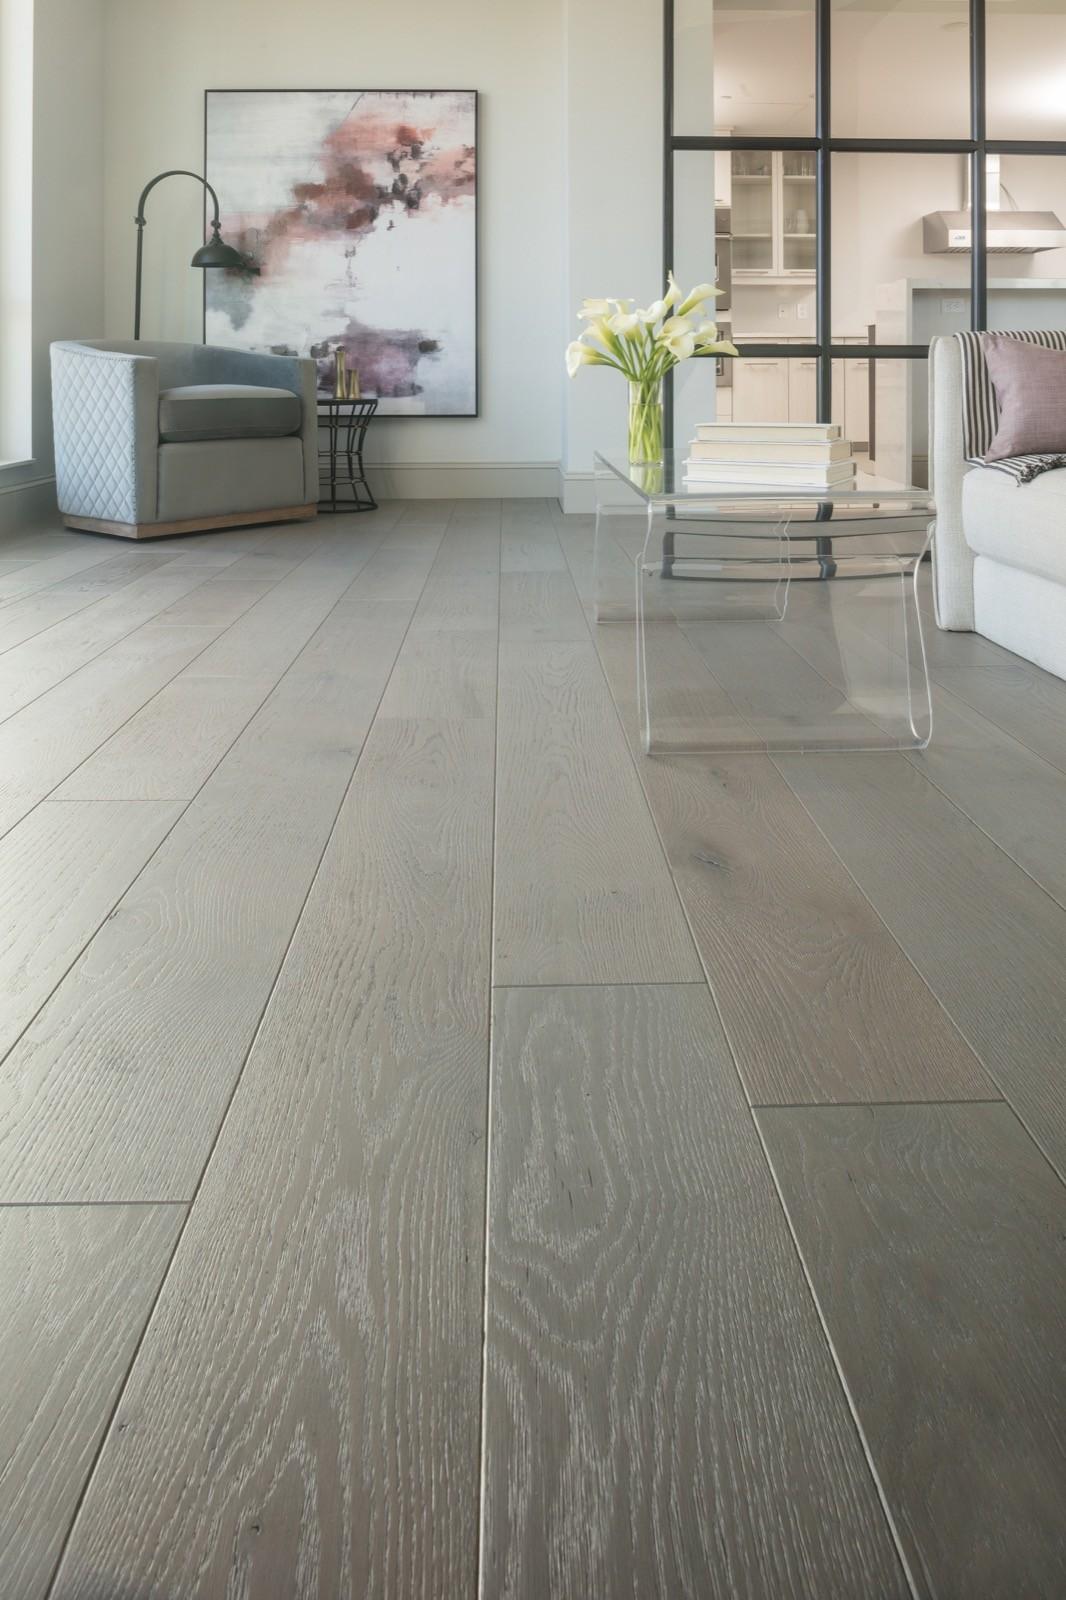 Kensington flooring | Pierce Flooring